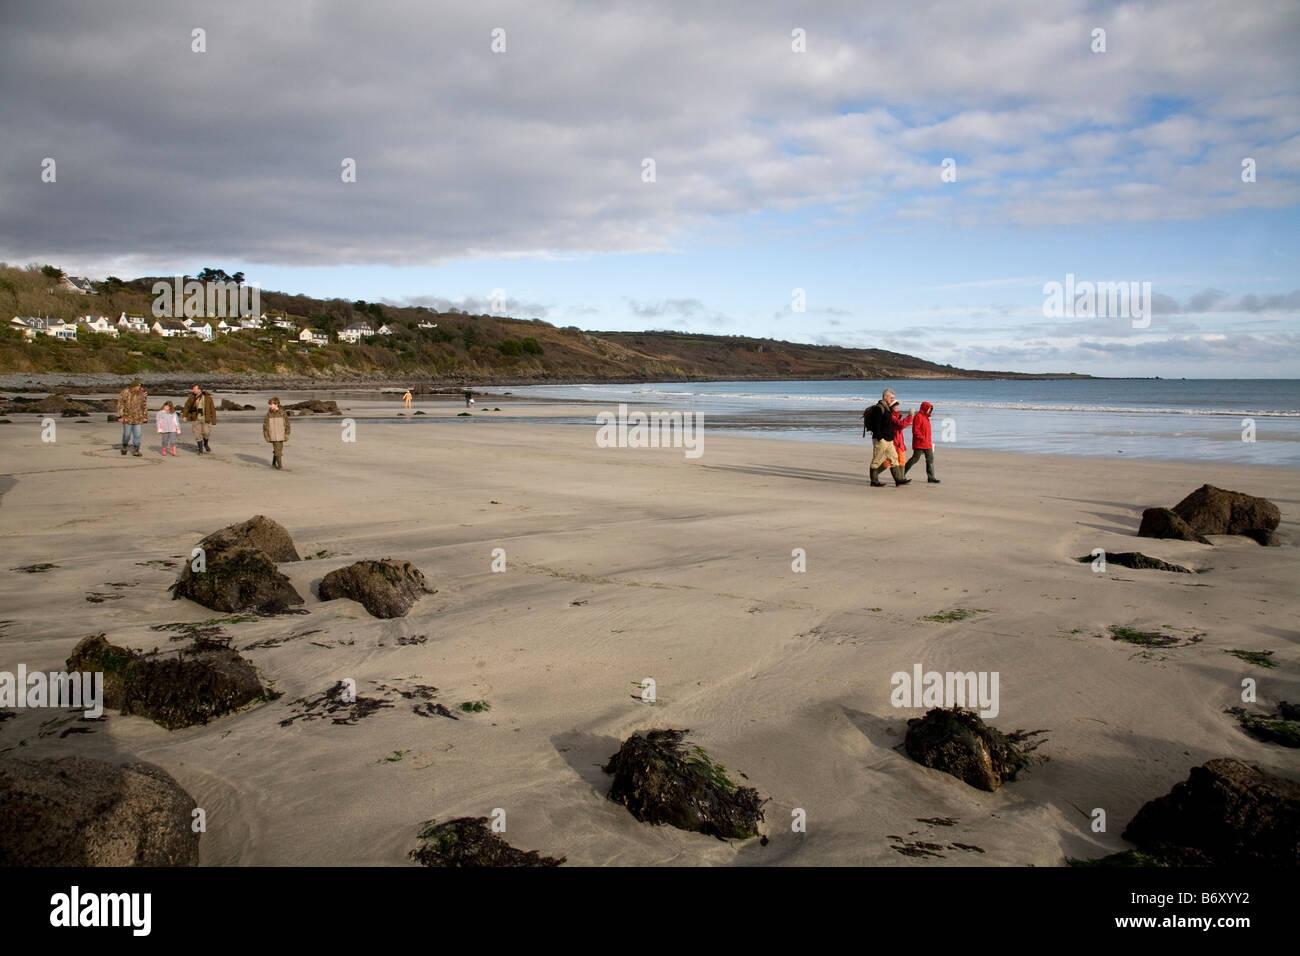 Excursión Geología coverack beach cornwall Imagen De Stock